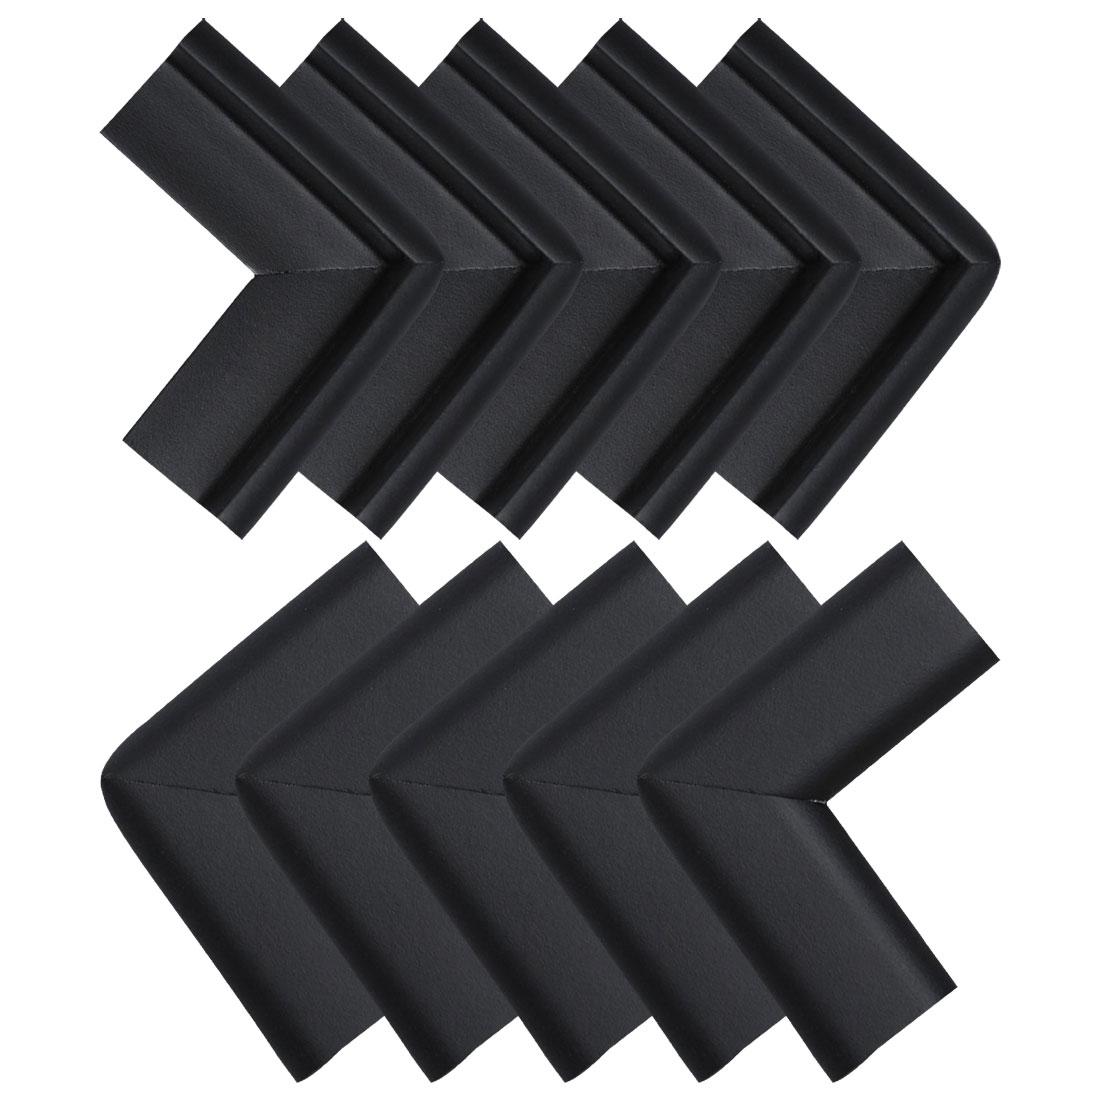 Desk Table Edge Foam Corner Cushion Guard Soft Bumper Protector 10pcs Black